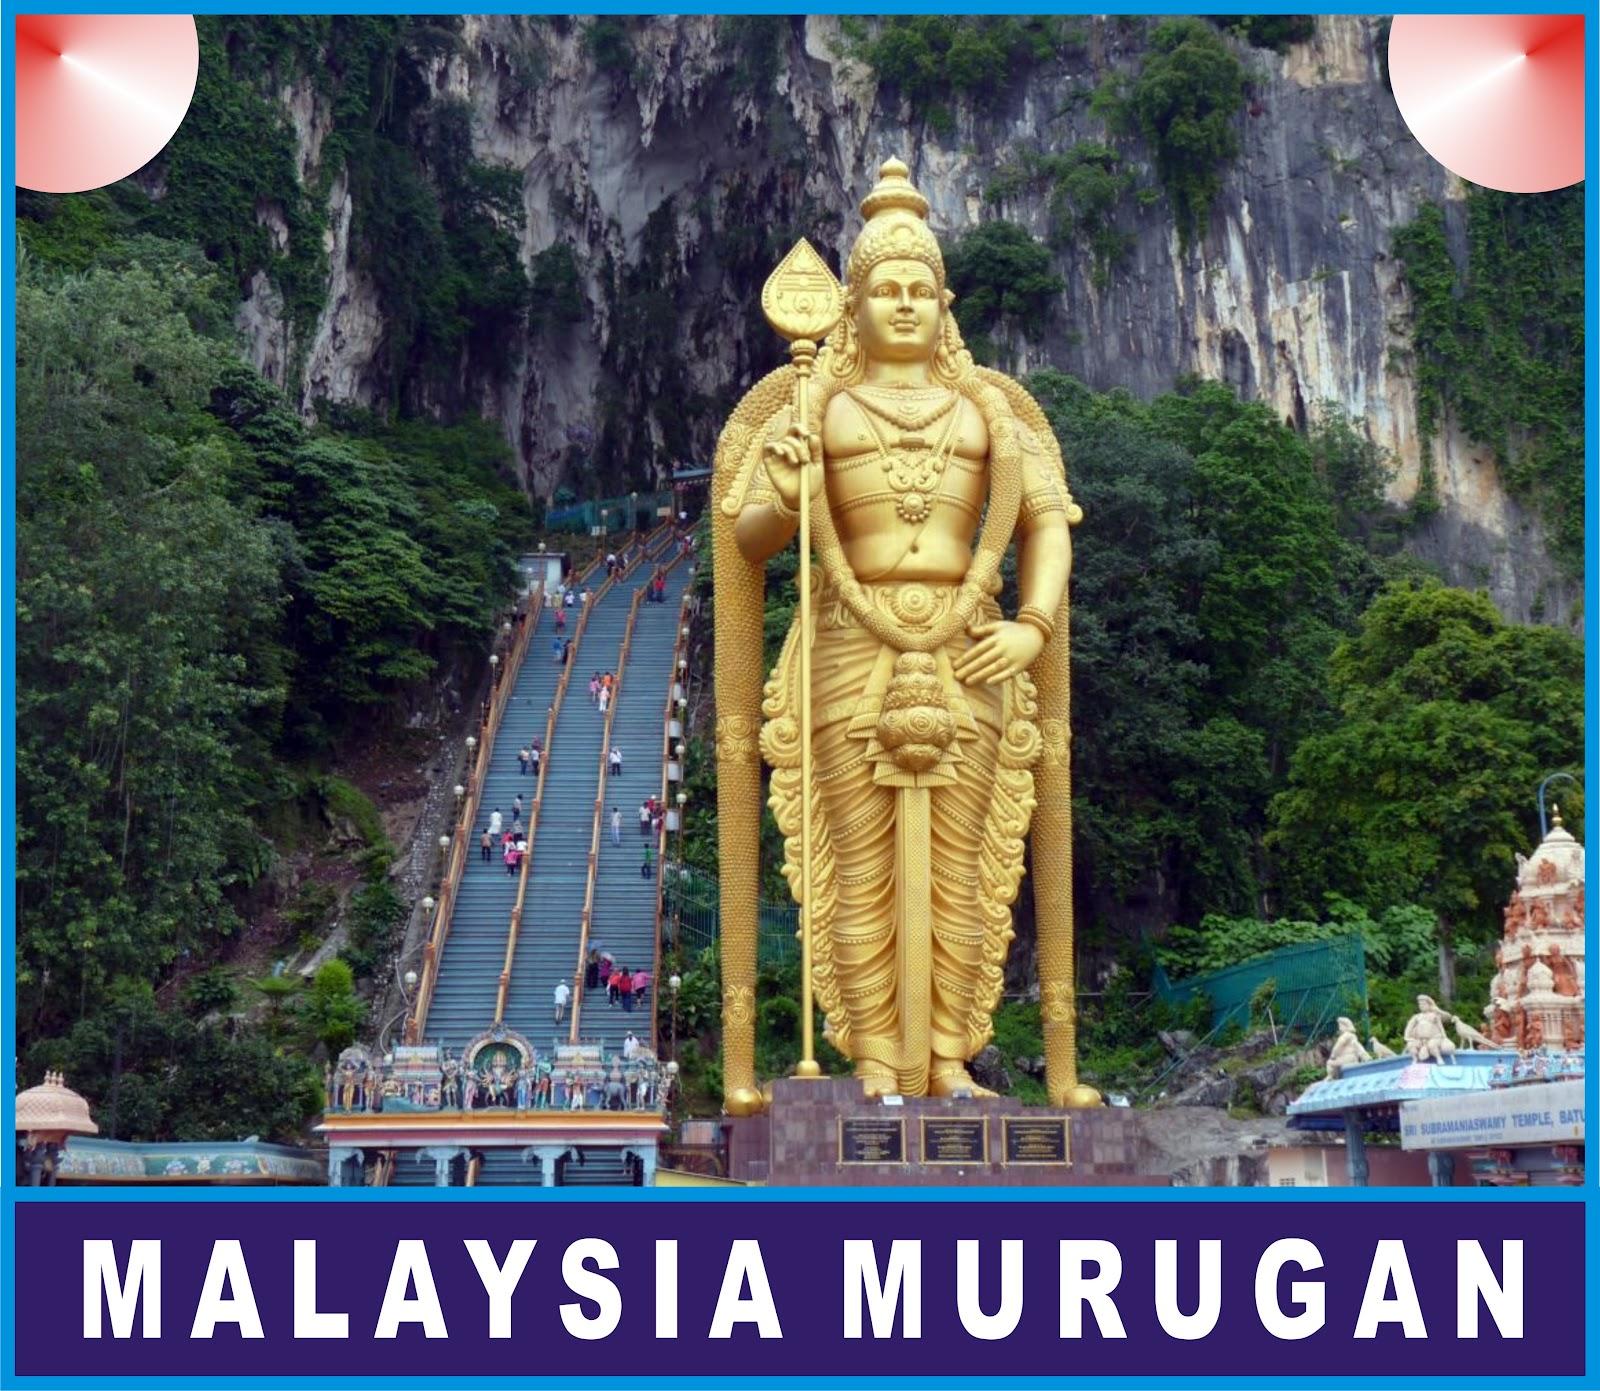 Malaysia Murugan: LOVE IS GOD